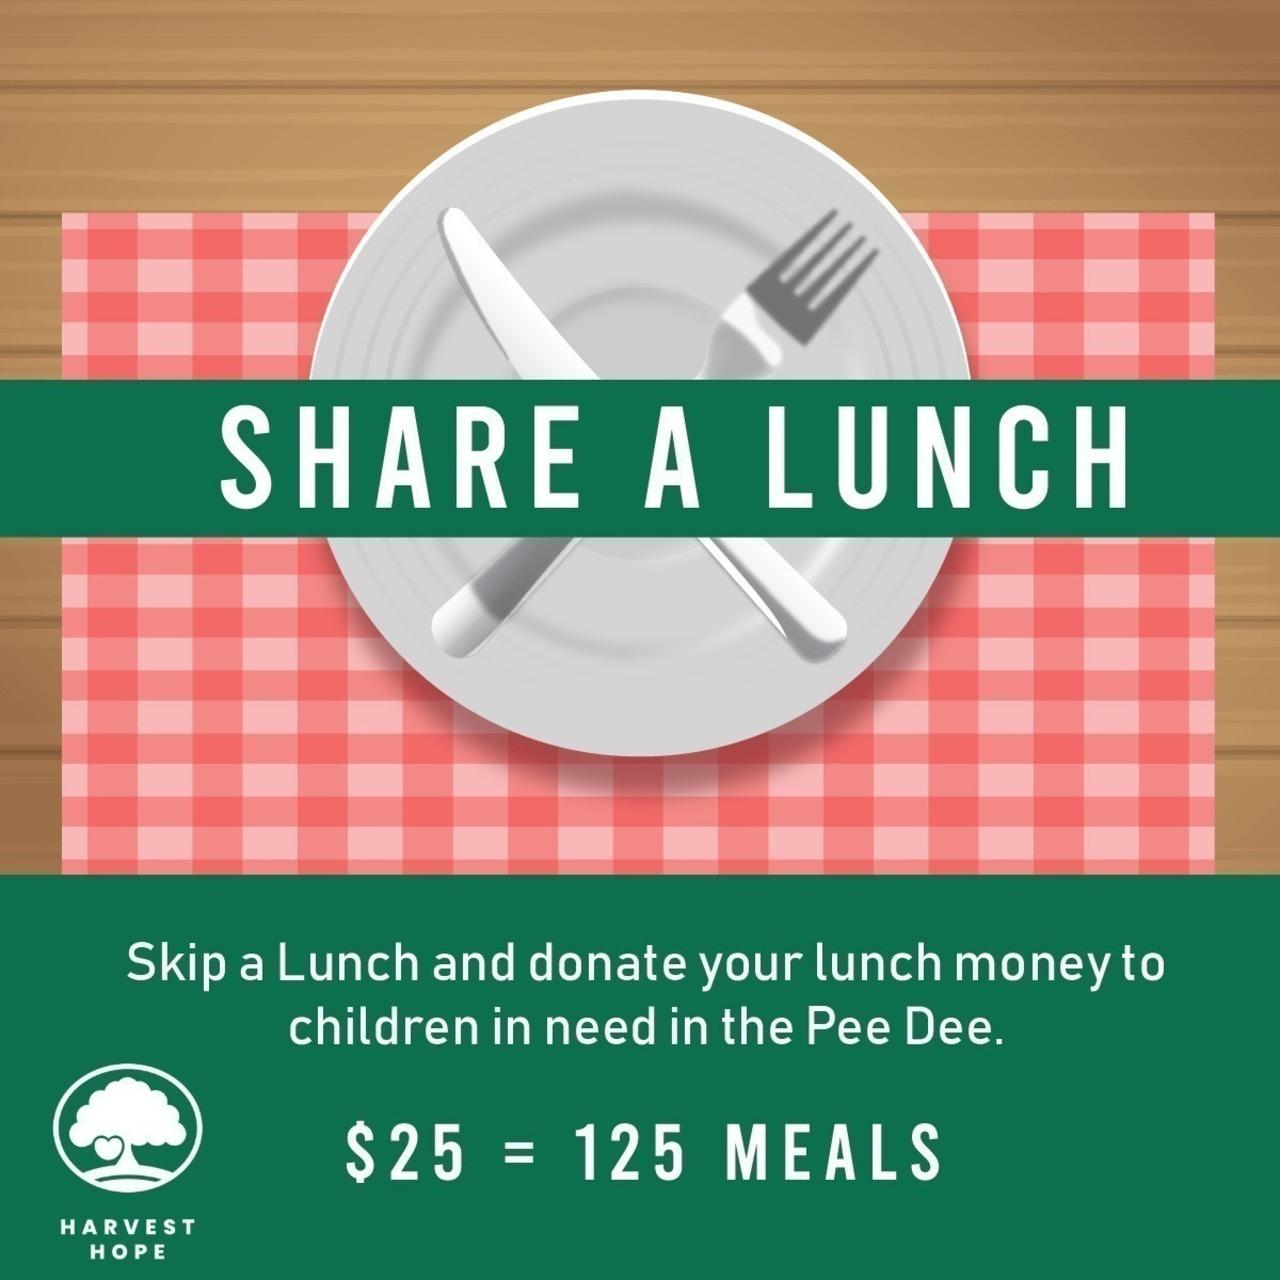 Share a Lunch Fundraiser for Harvest Hope